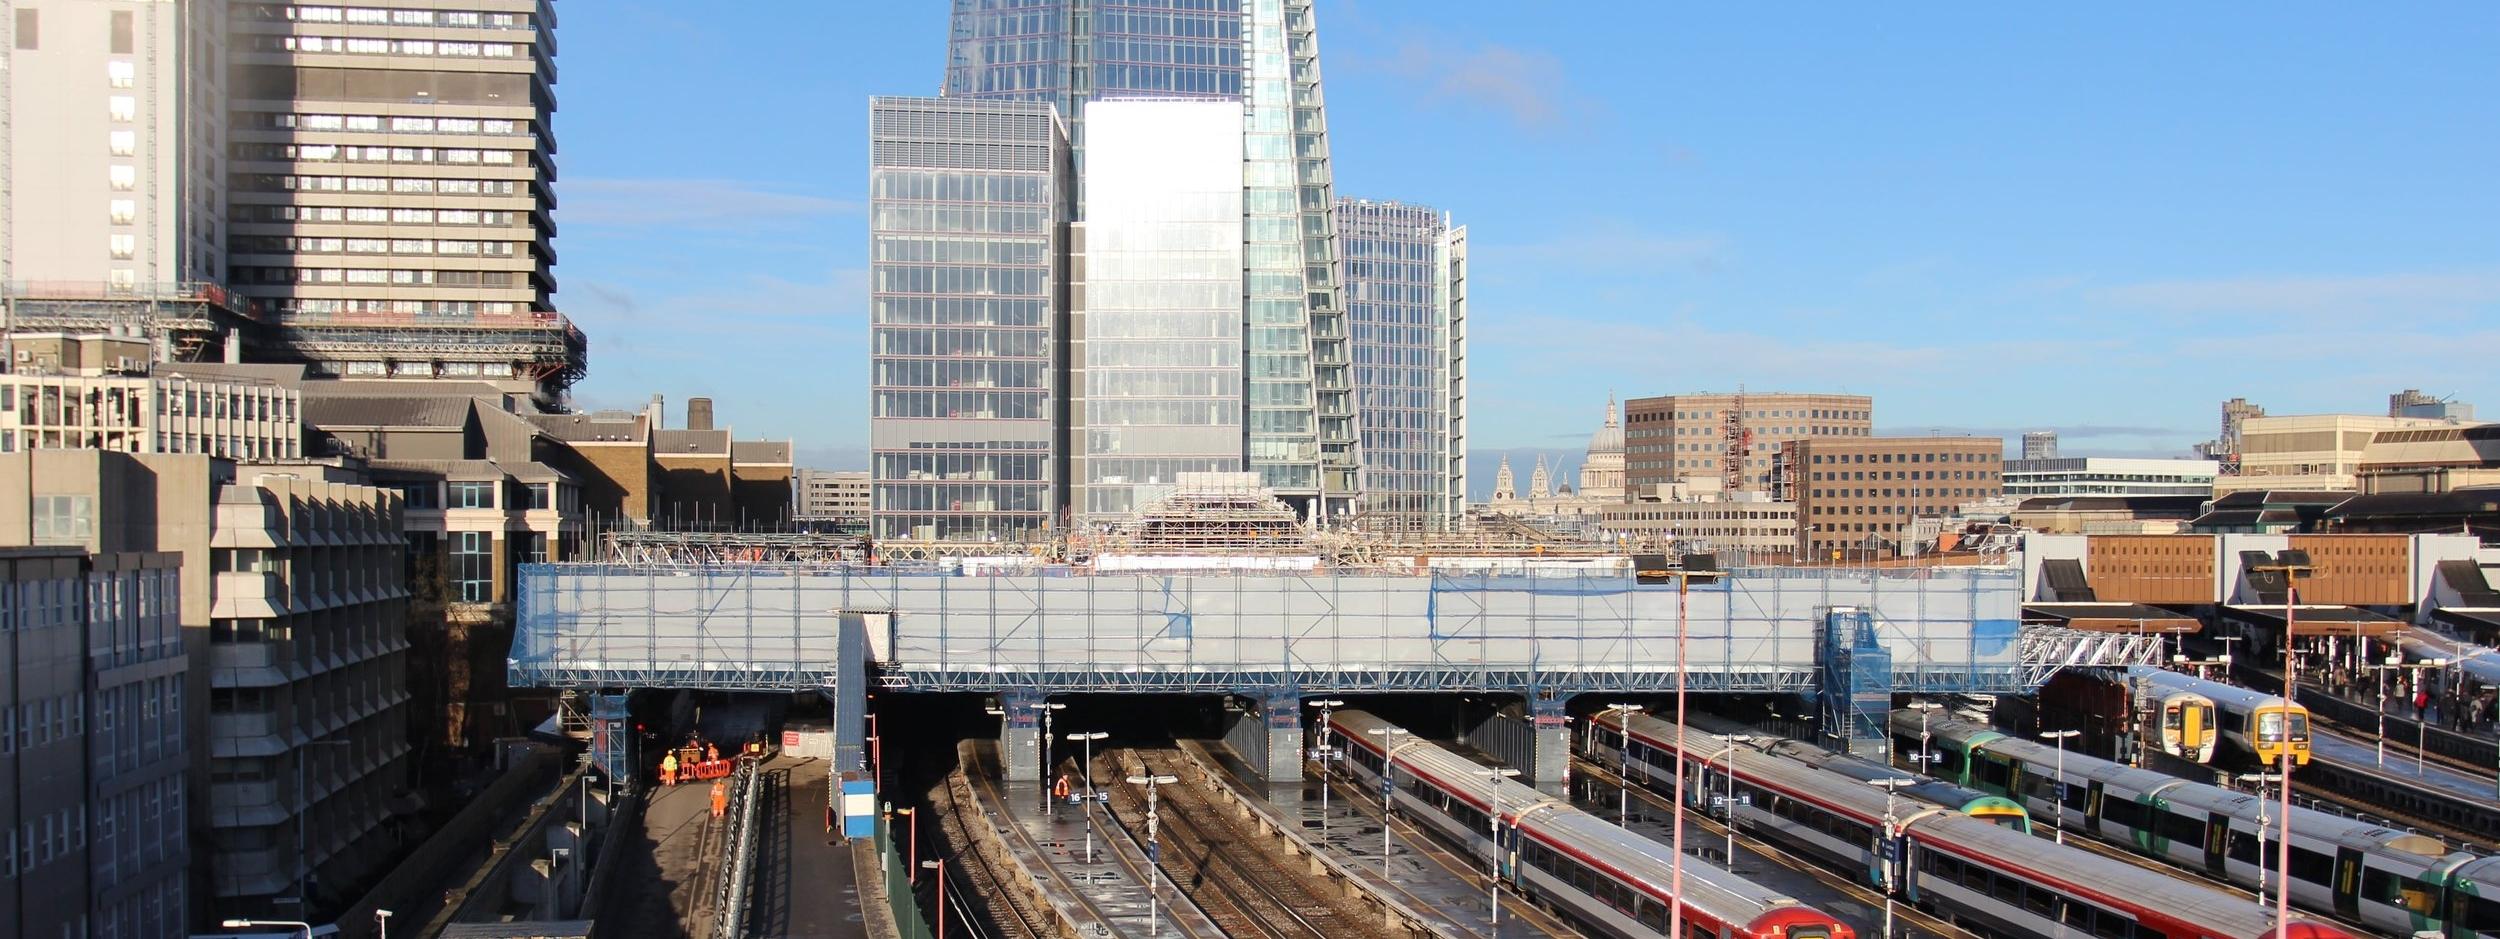 Scaffolding design for Network Rail at London Bridge Station